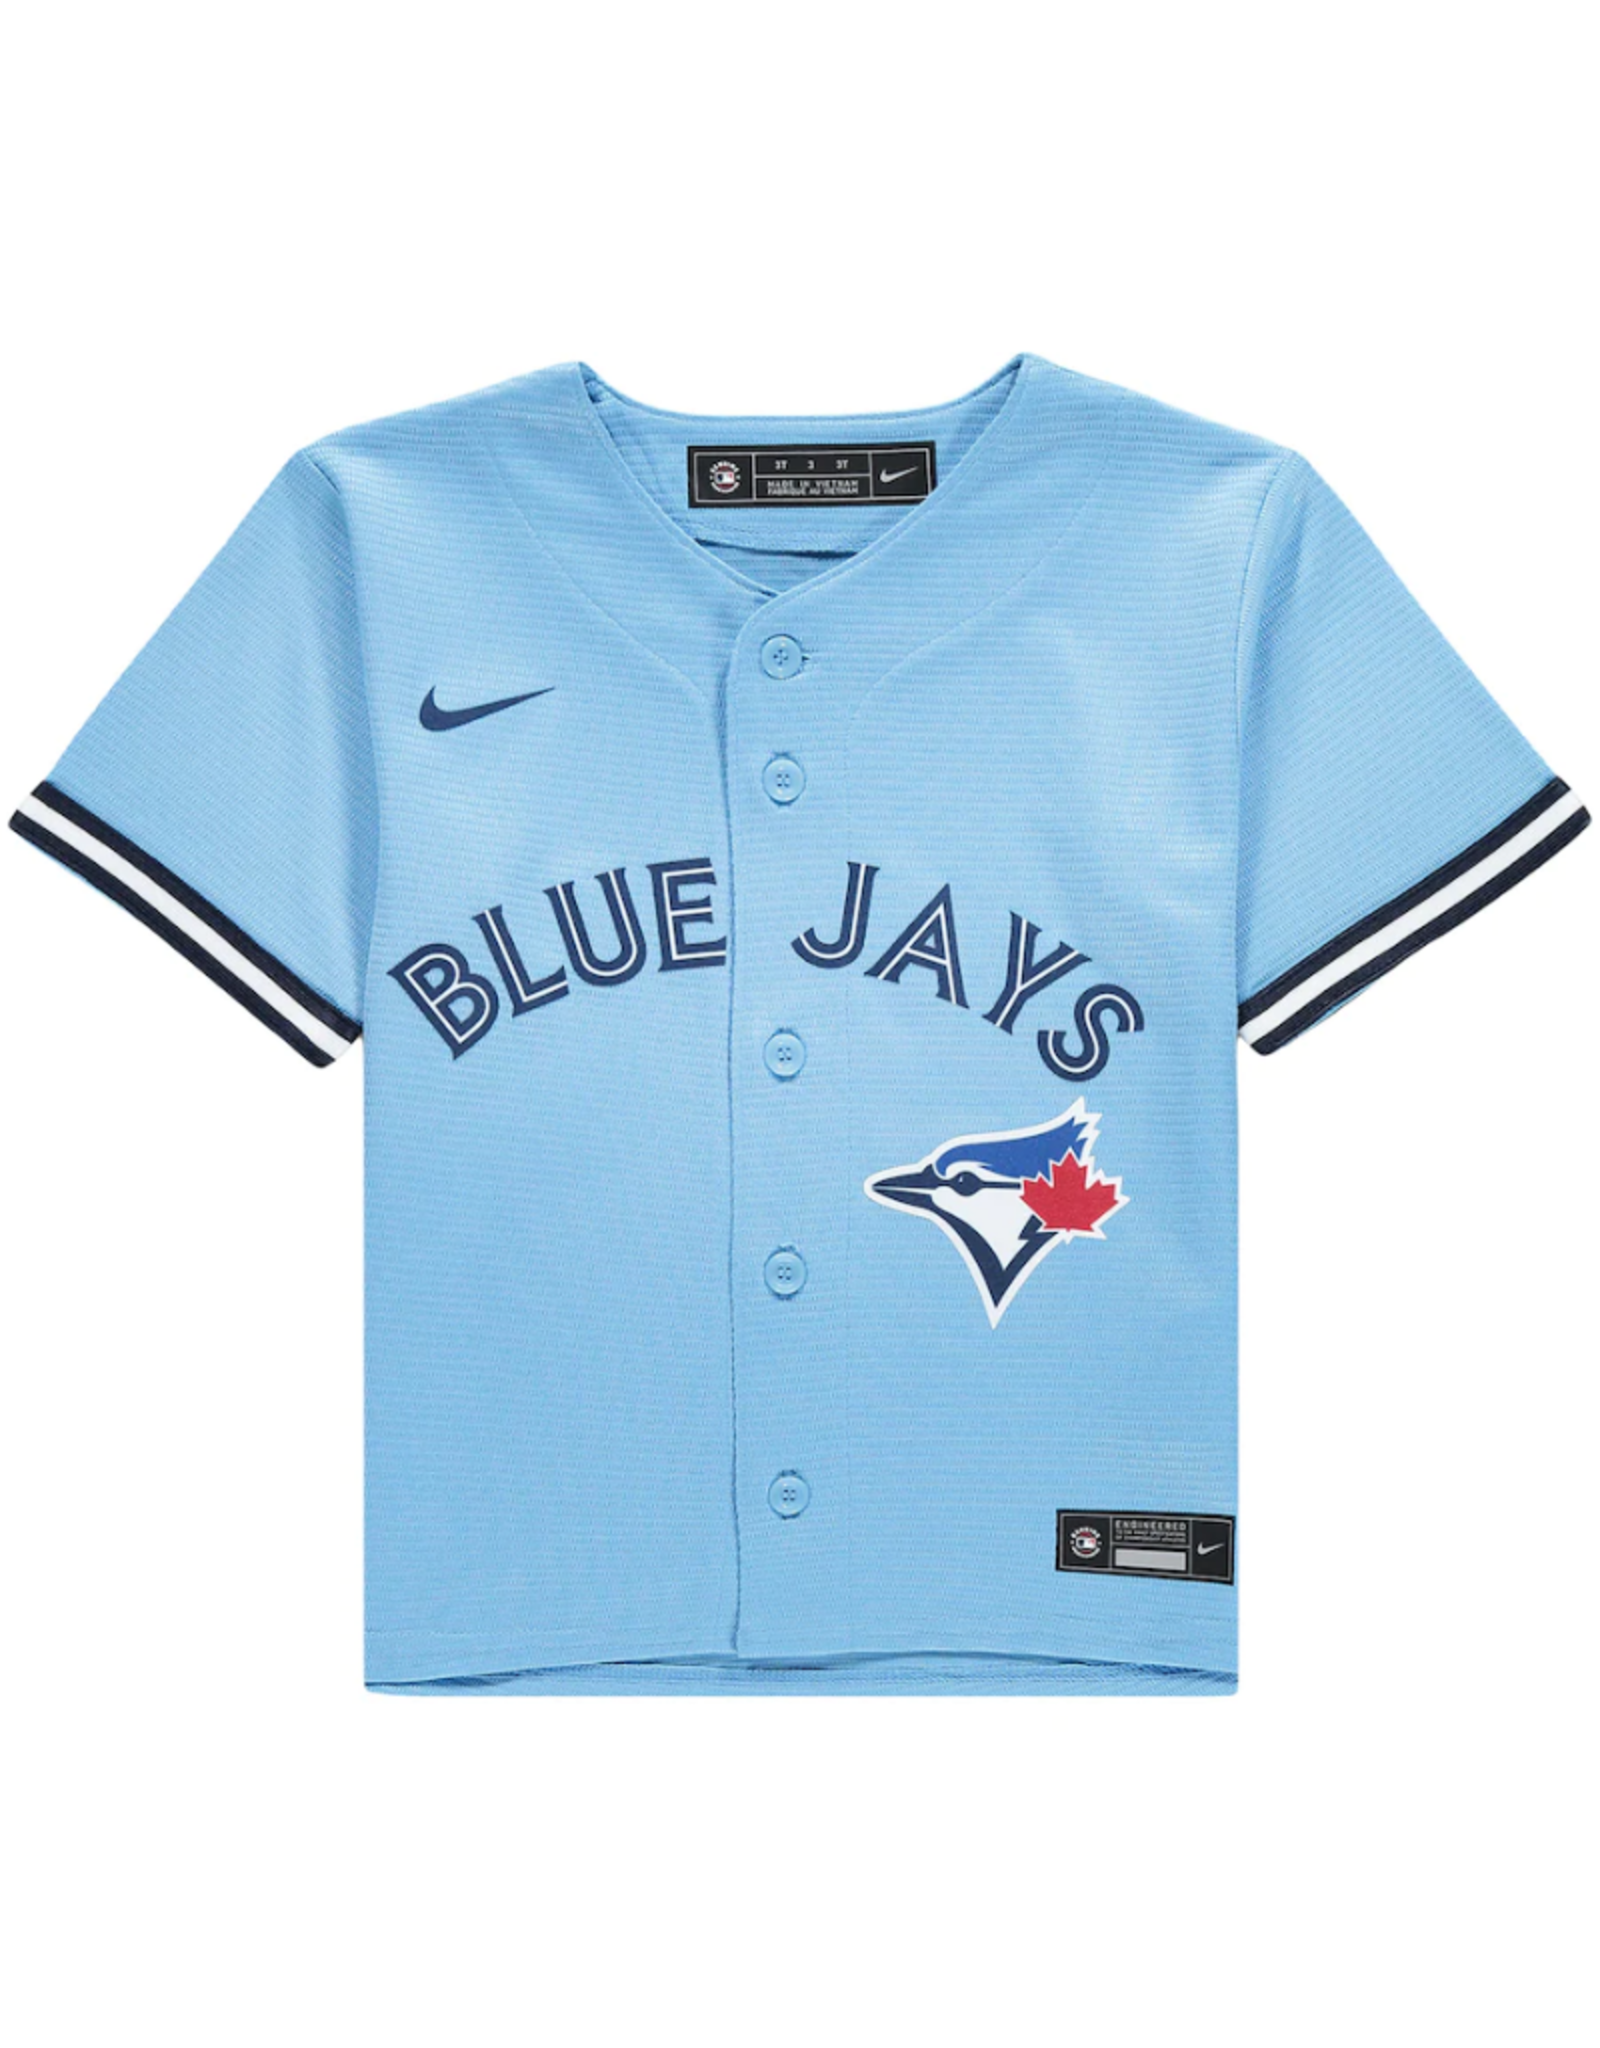 Nike Toddler Replica Jersey Toronto Blue Jays Valor Blue